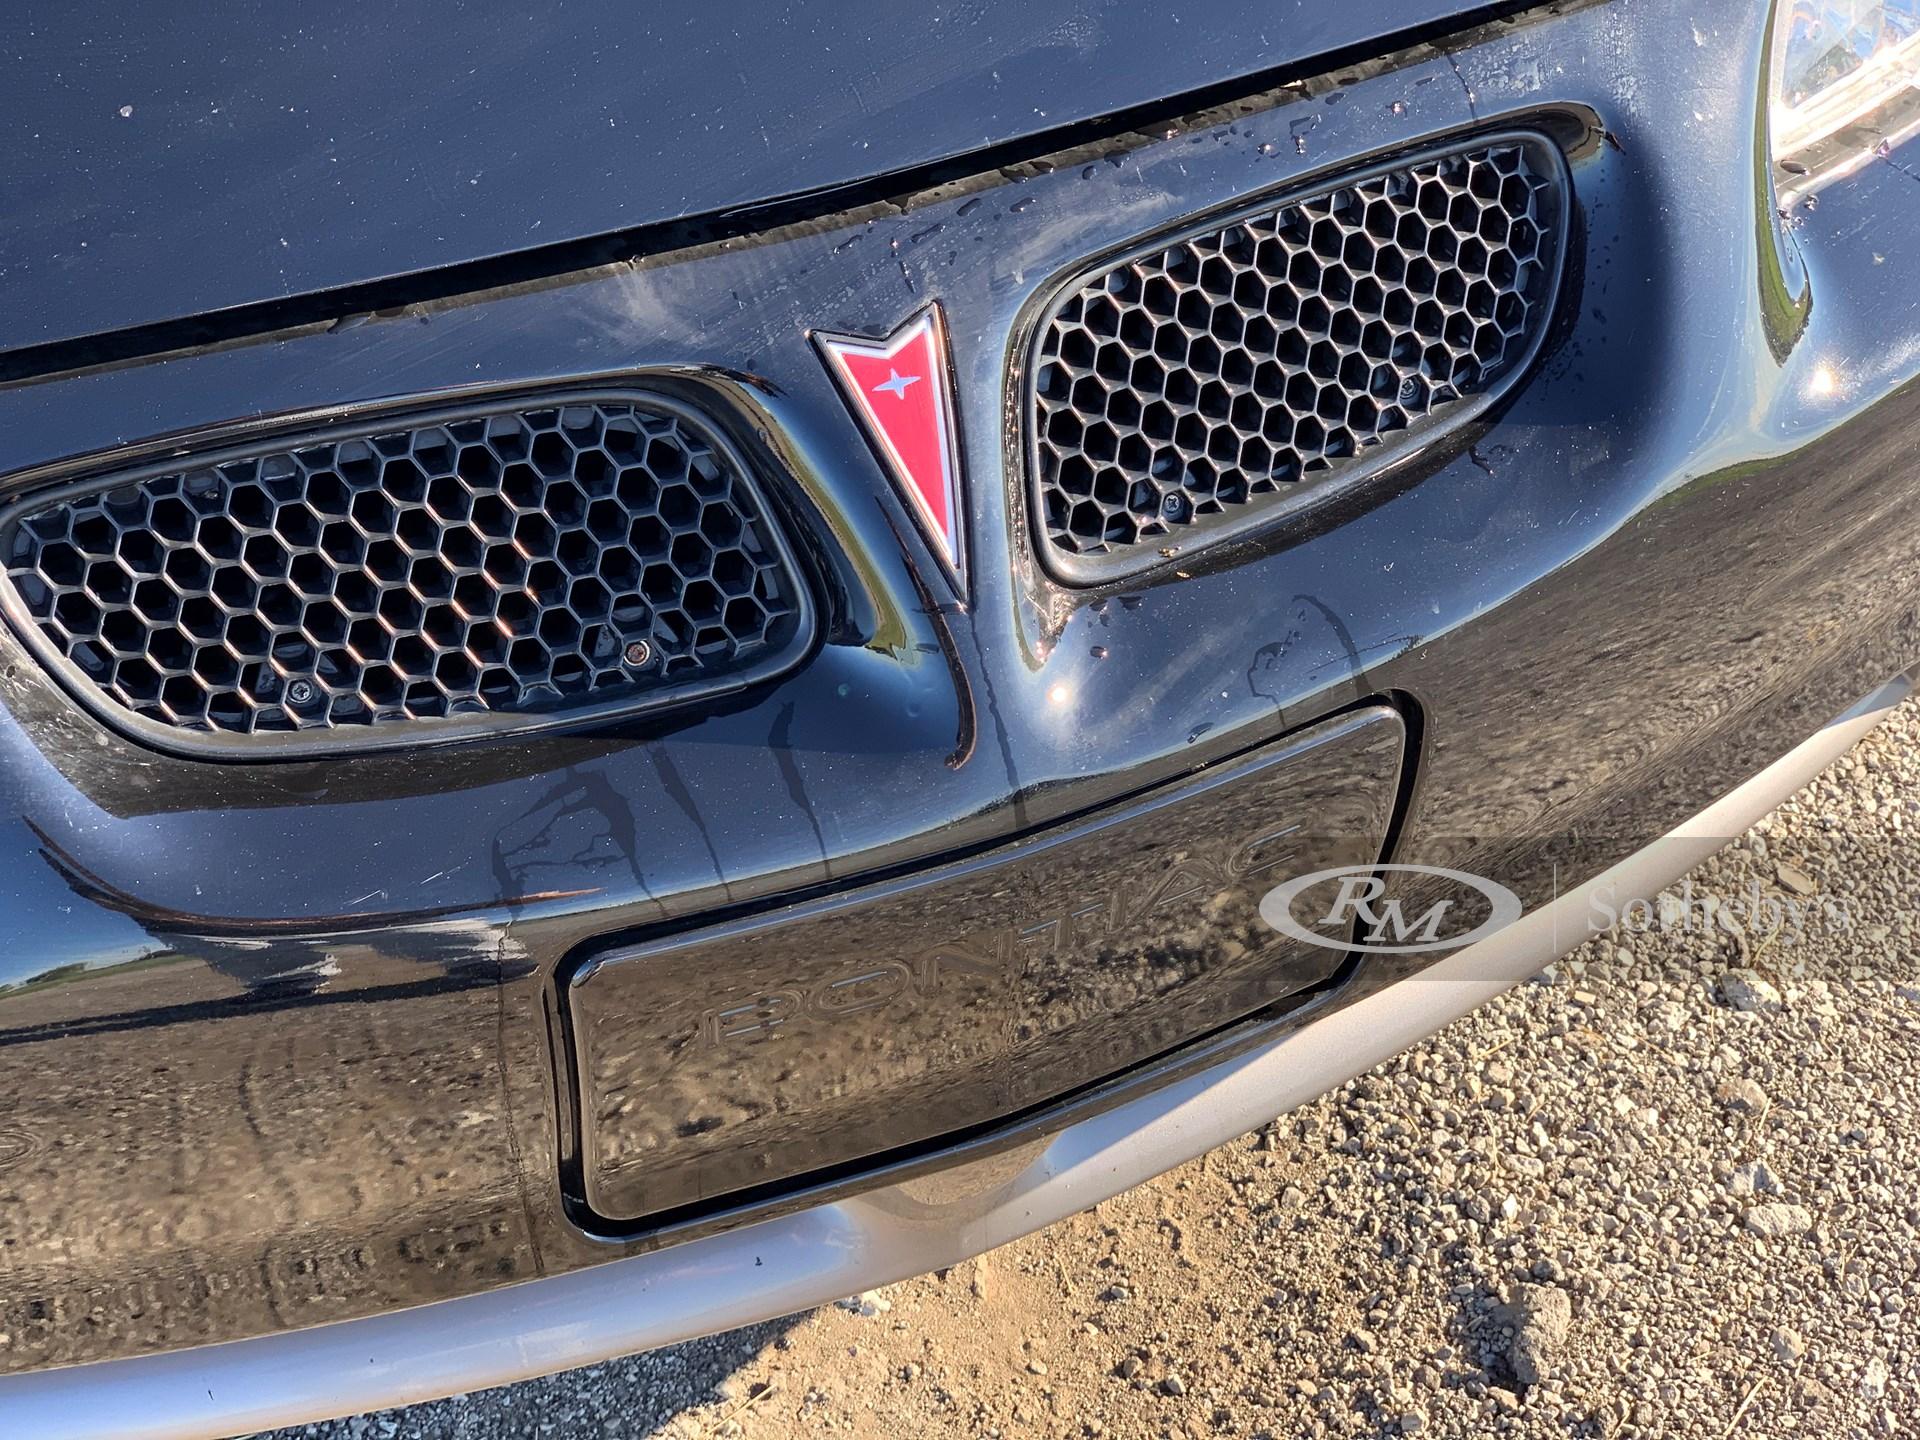 2000 Pontiac Grand Prix GTP | Auburn Fall 2020 | RM Auctions